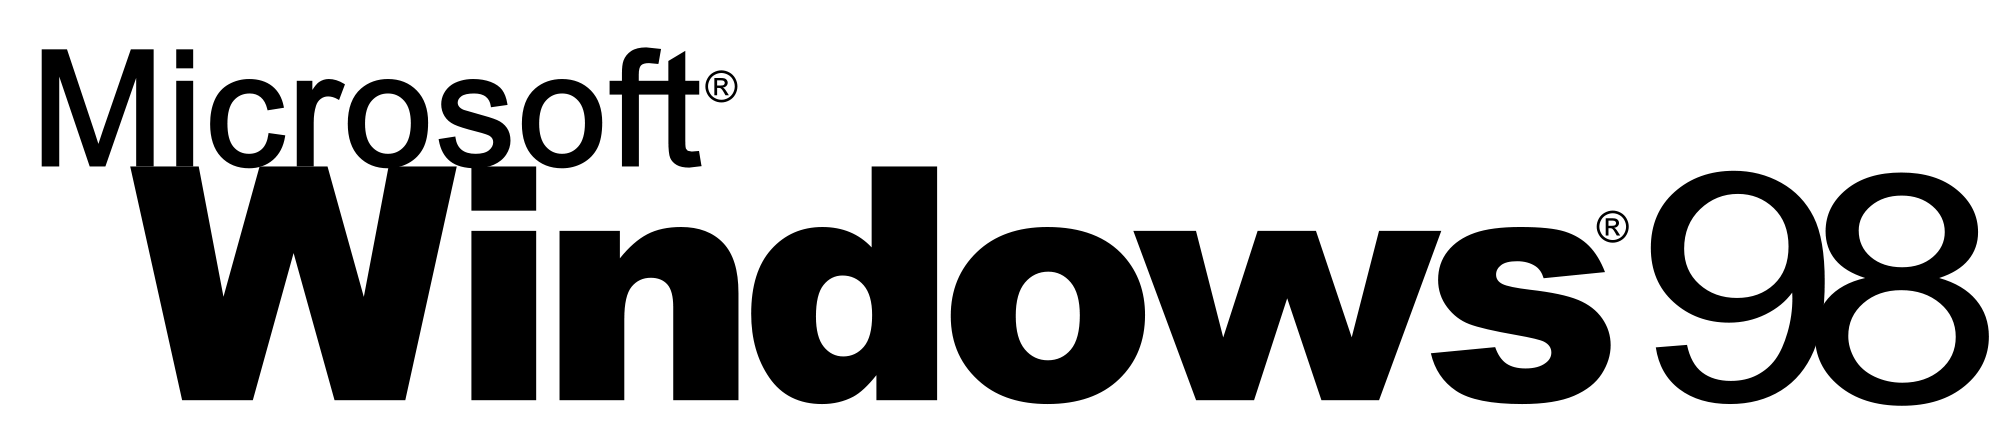 Image px logo milgreen. Svg to png windows